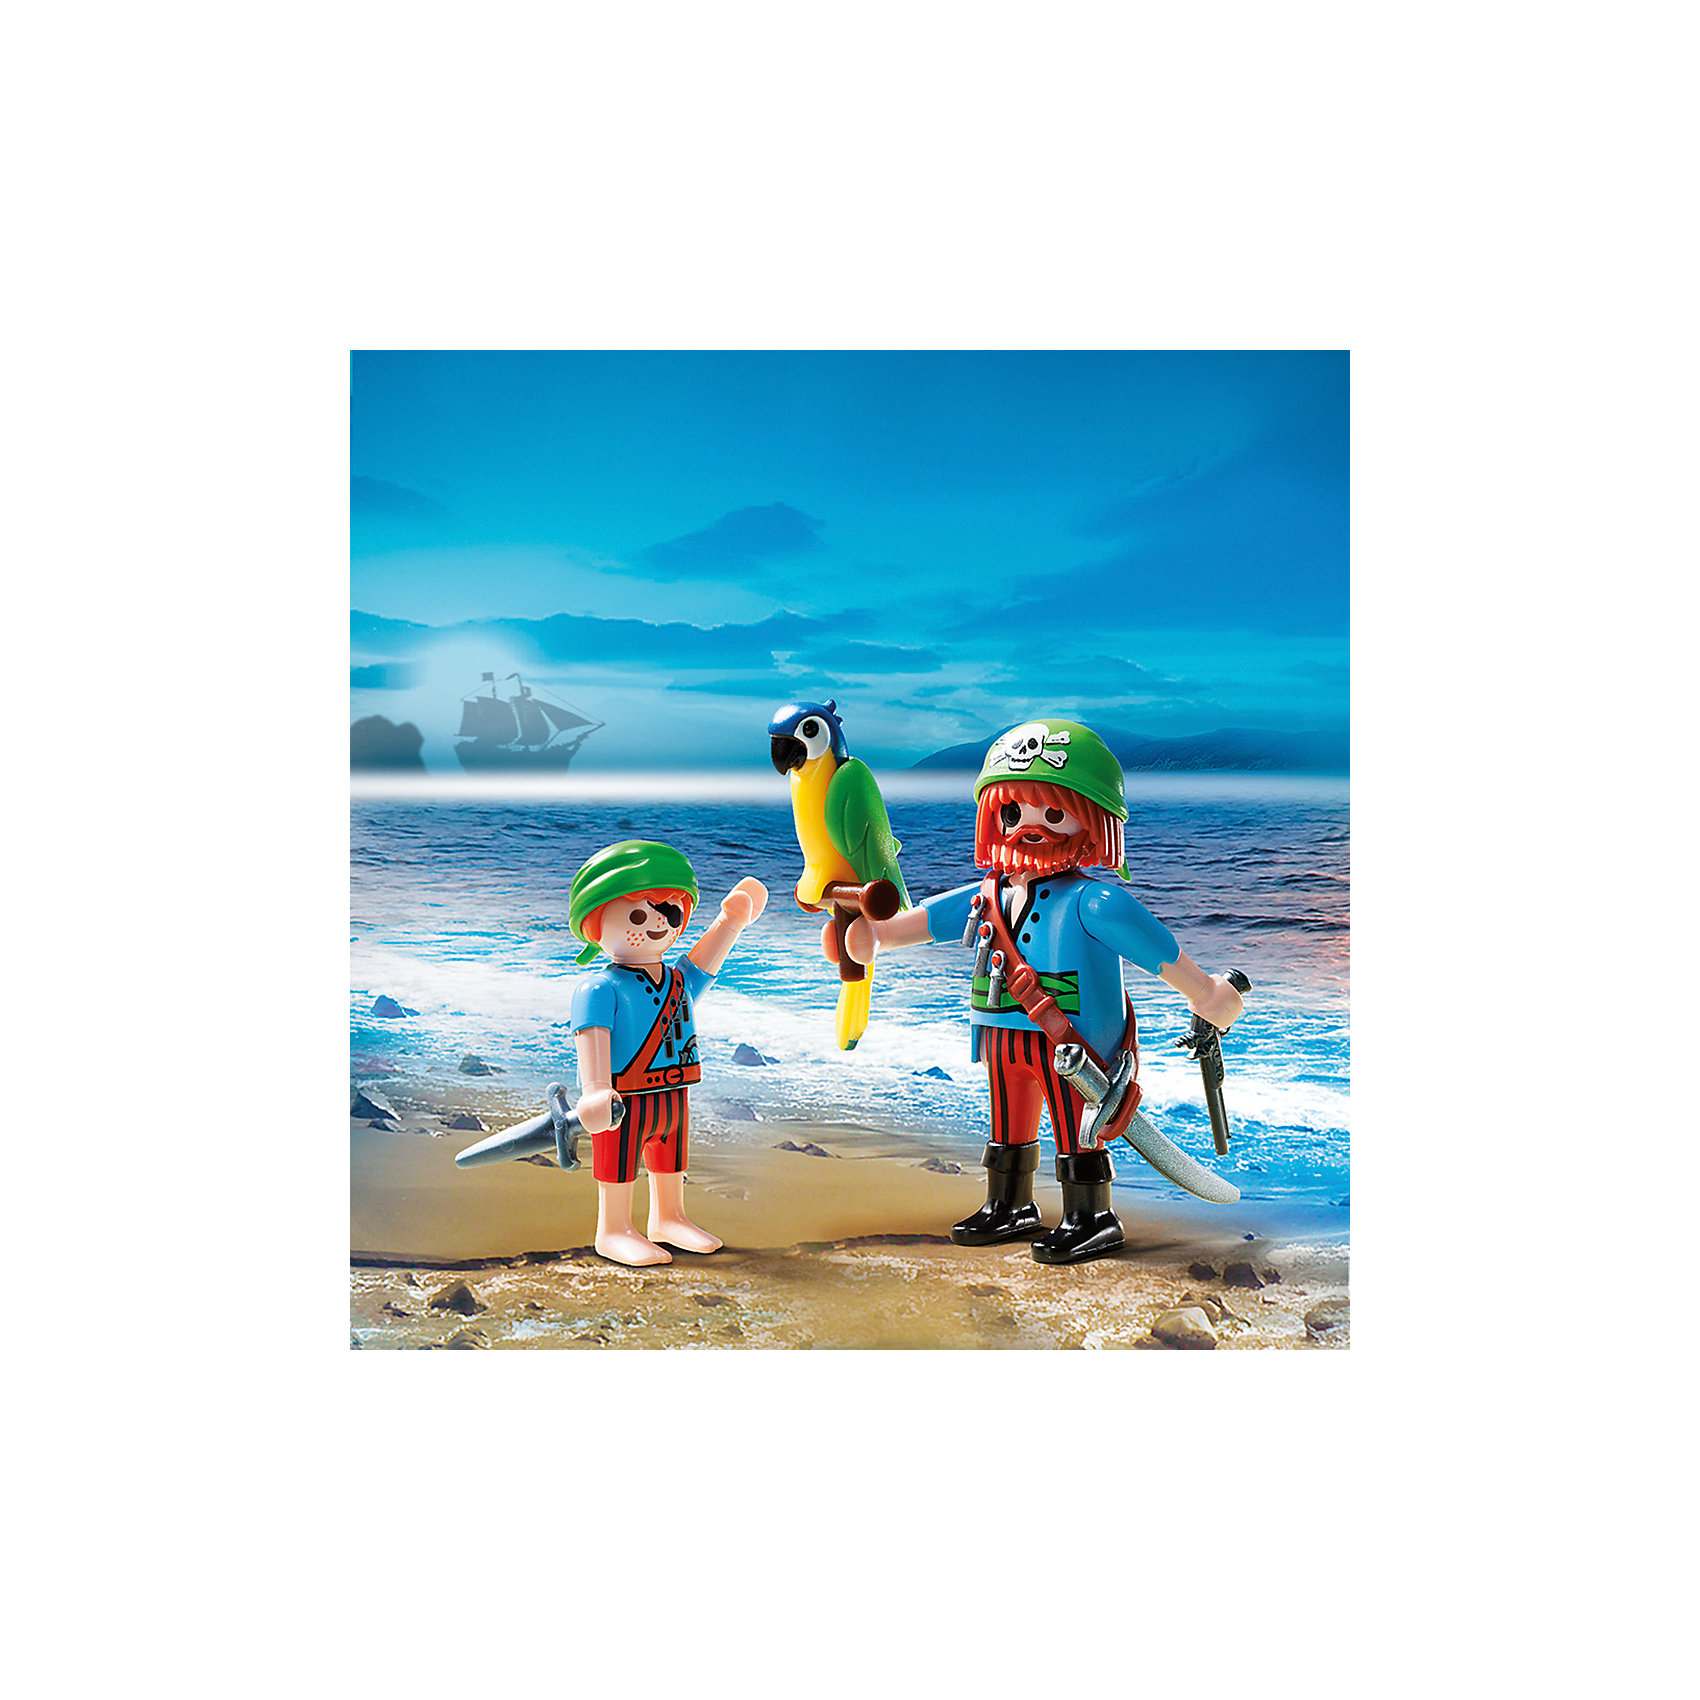 PLAYMOBIL® ДУО: Пираты отец с сыном, PLAYMOBIL фигурки игрушки playmobil зоопарк стая фламинго